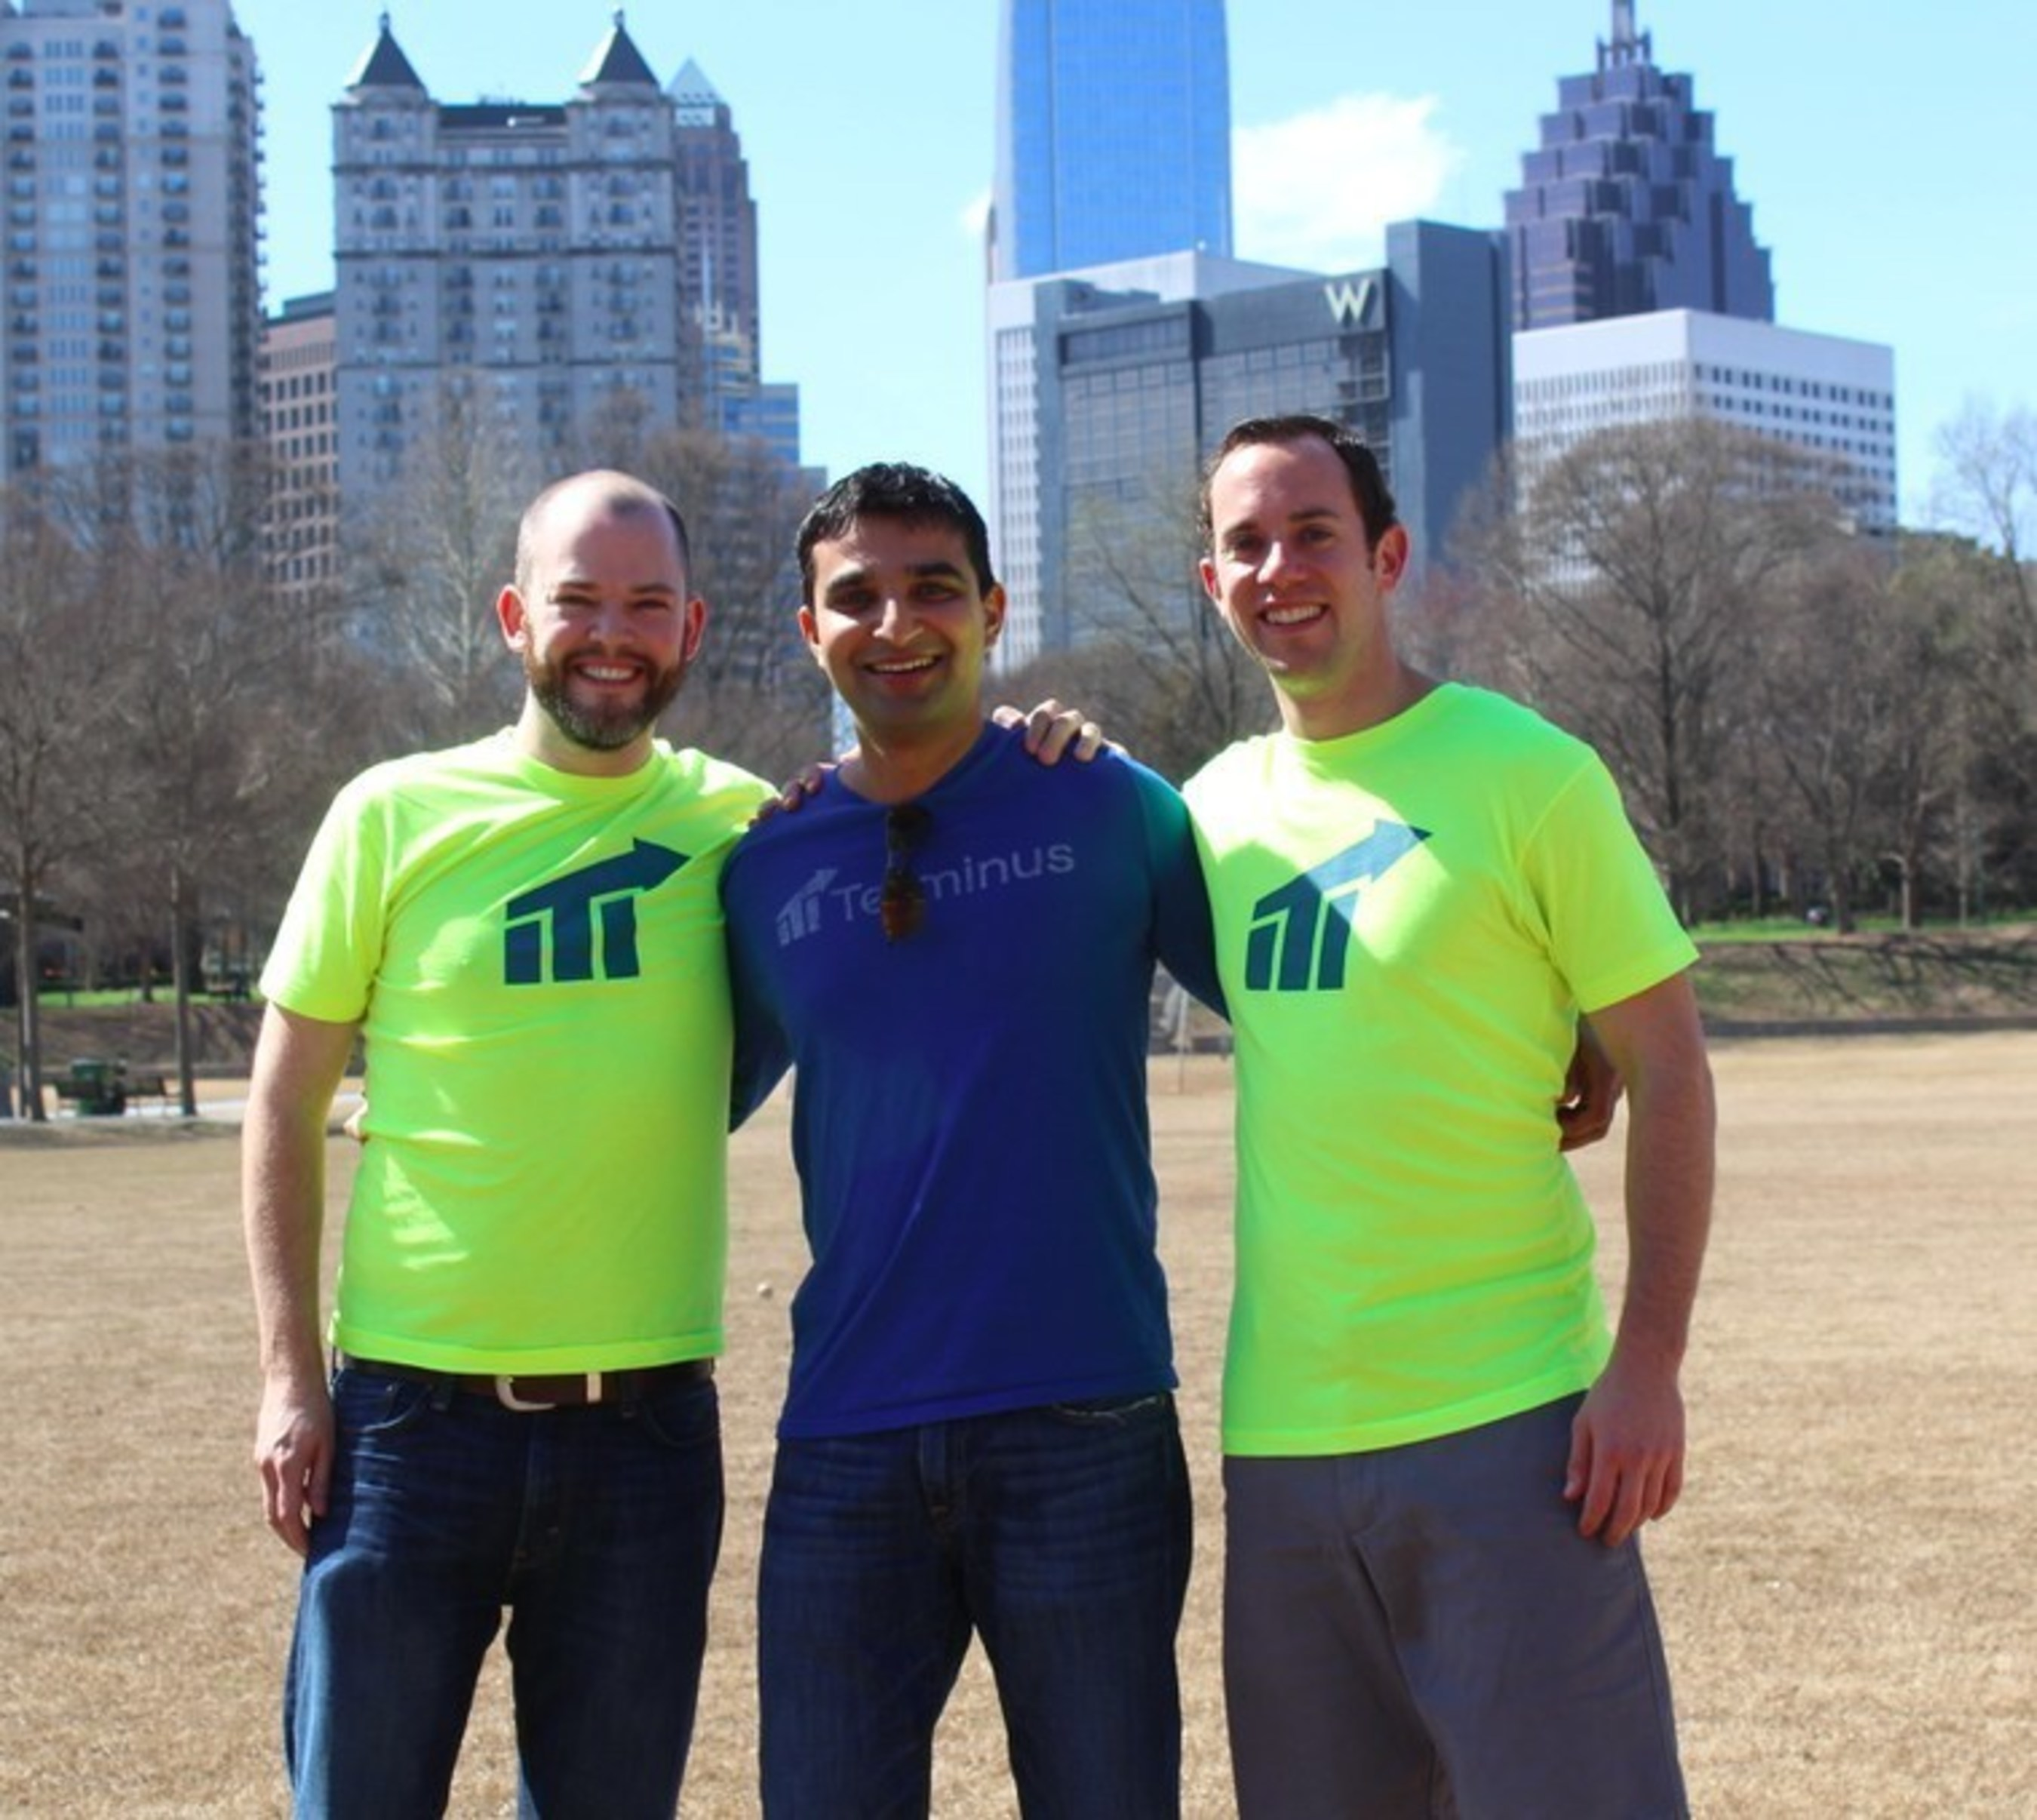 Terminus co-founders Eric Vass (CTO), Sangram Vajre (CMO), and Eric Spett (CEO).